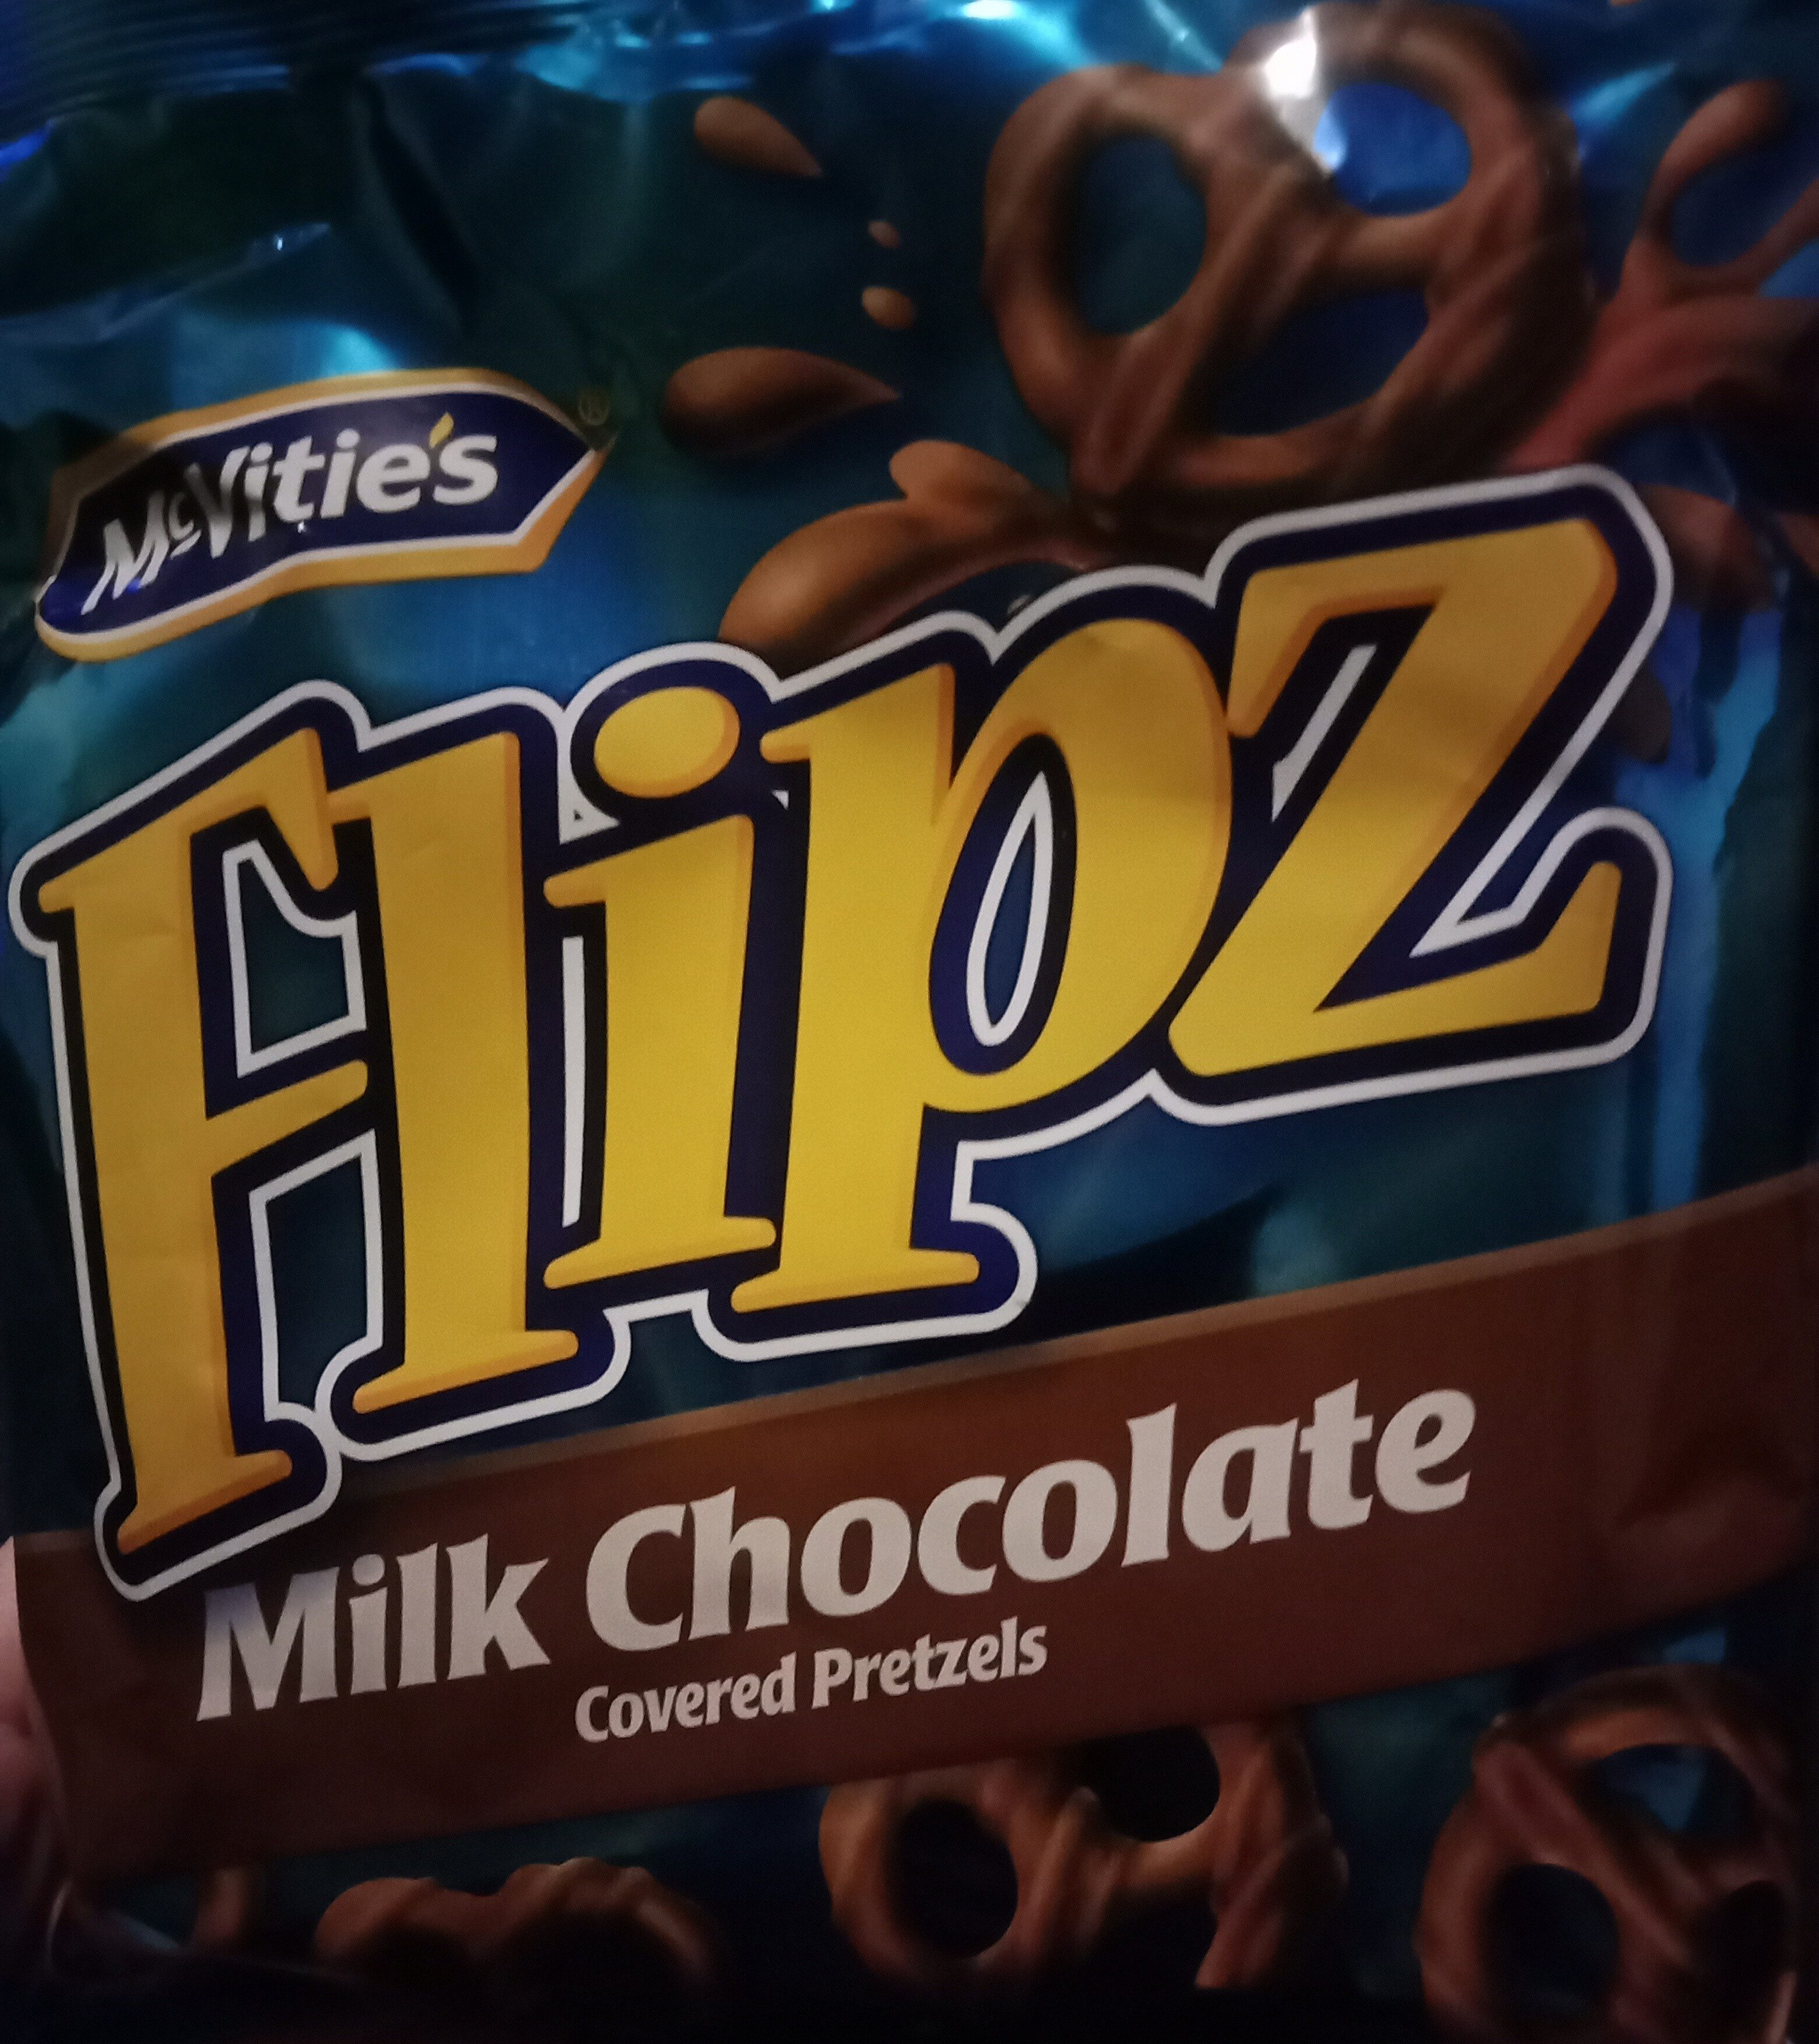 Flipz milk chocolate - Ingrédients - en